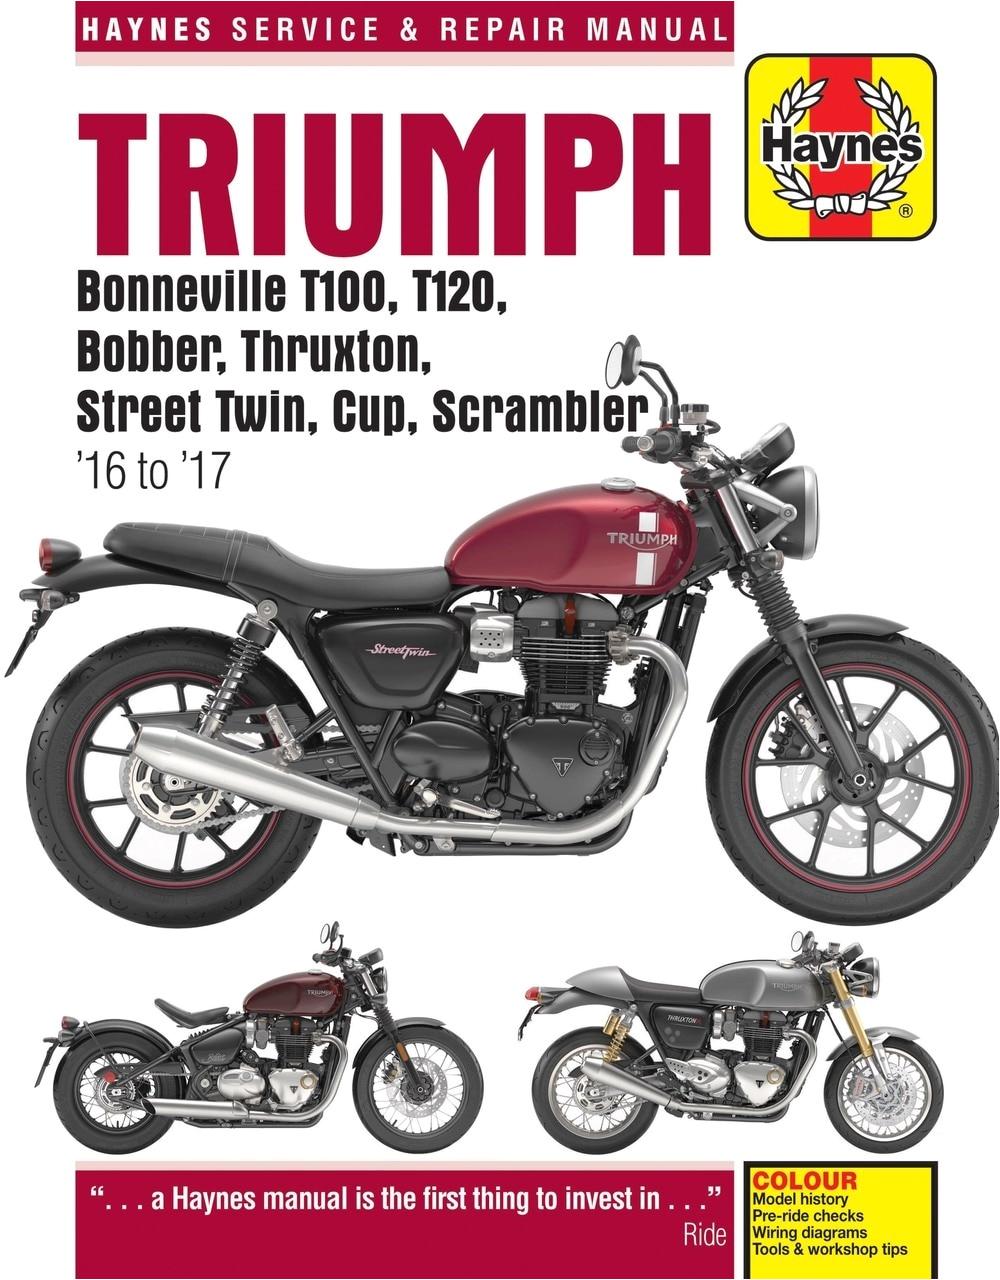 triumph bonneville t100 t120 bobber thruxton street twin cup scrambler 2016 2017 haynes repair manual